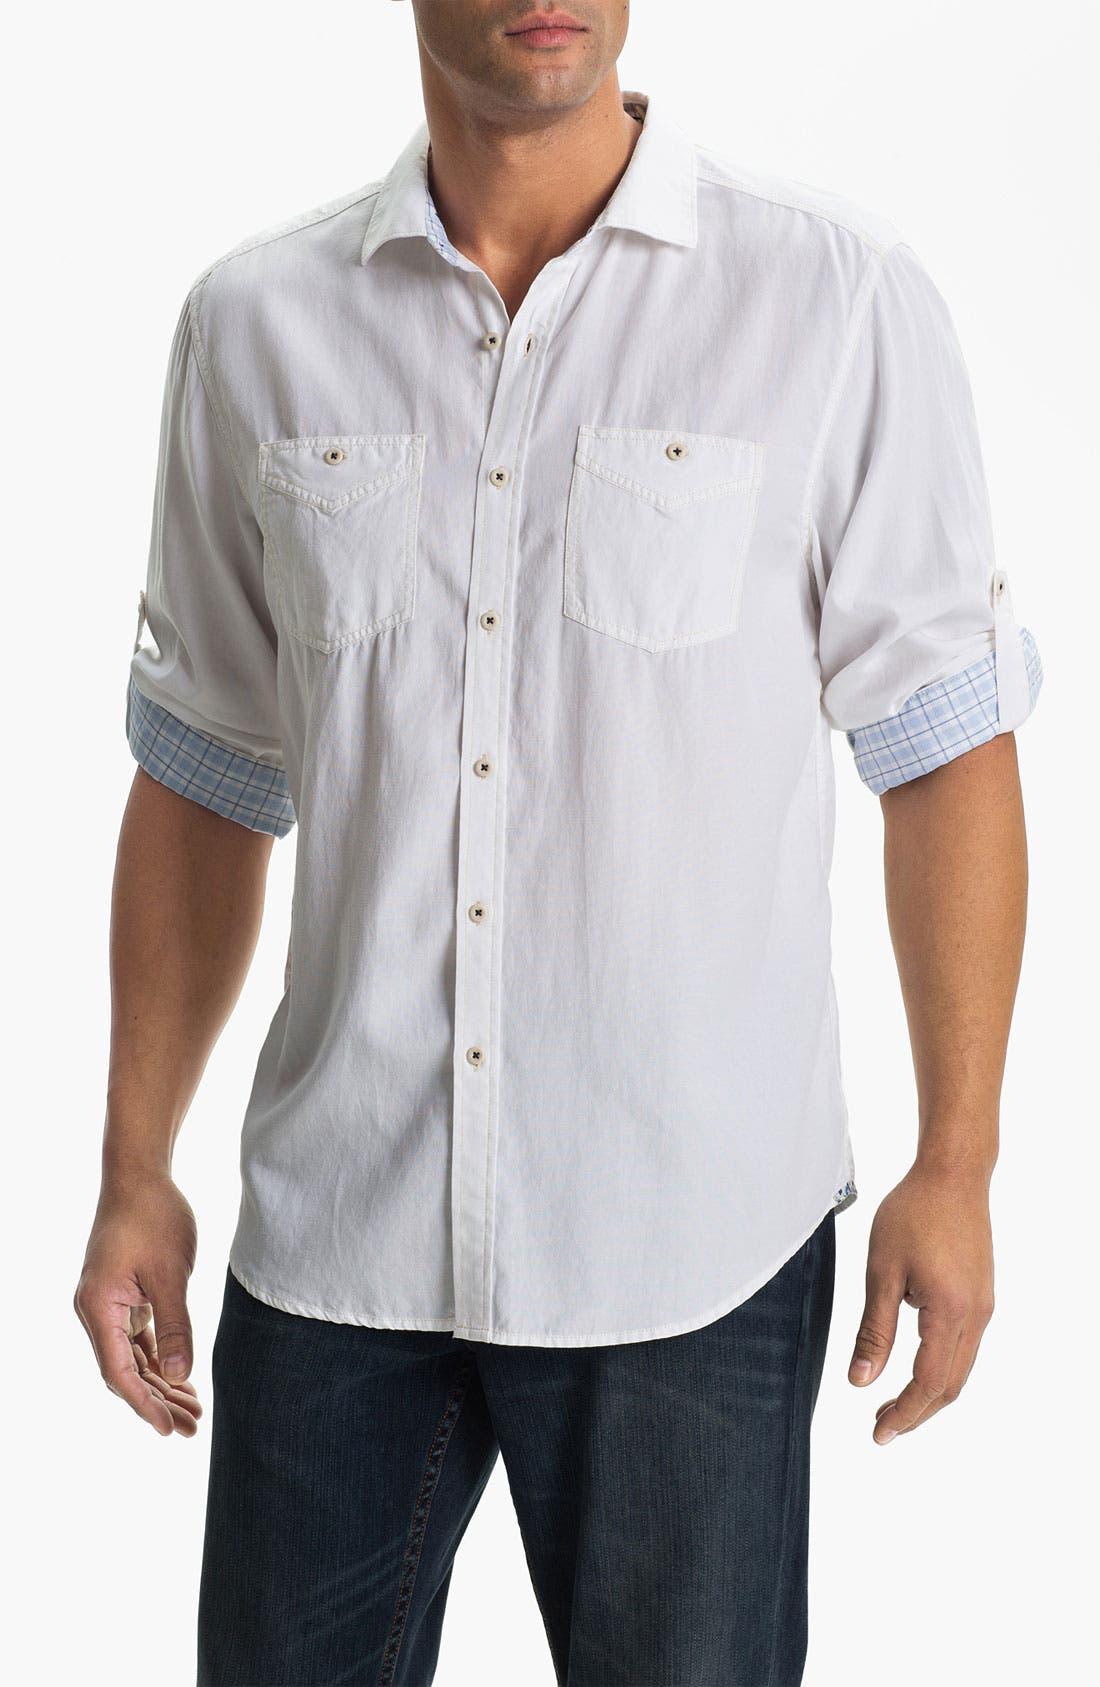 Alternate Image 1 Selected - Tommy Bahama Denim 'Sand City' Island Modern Fit Sport Shirt